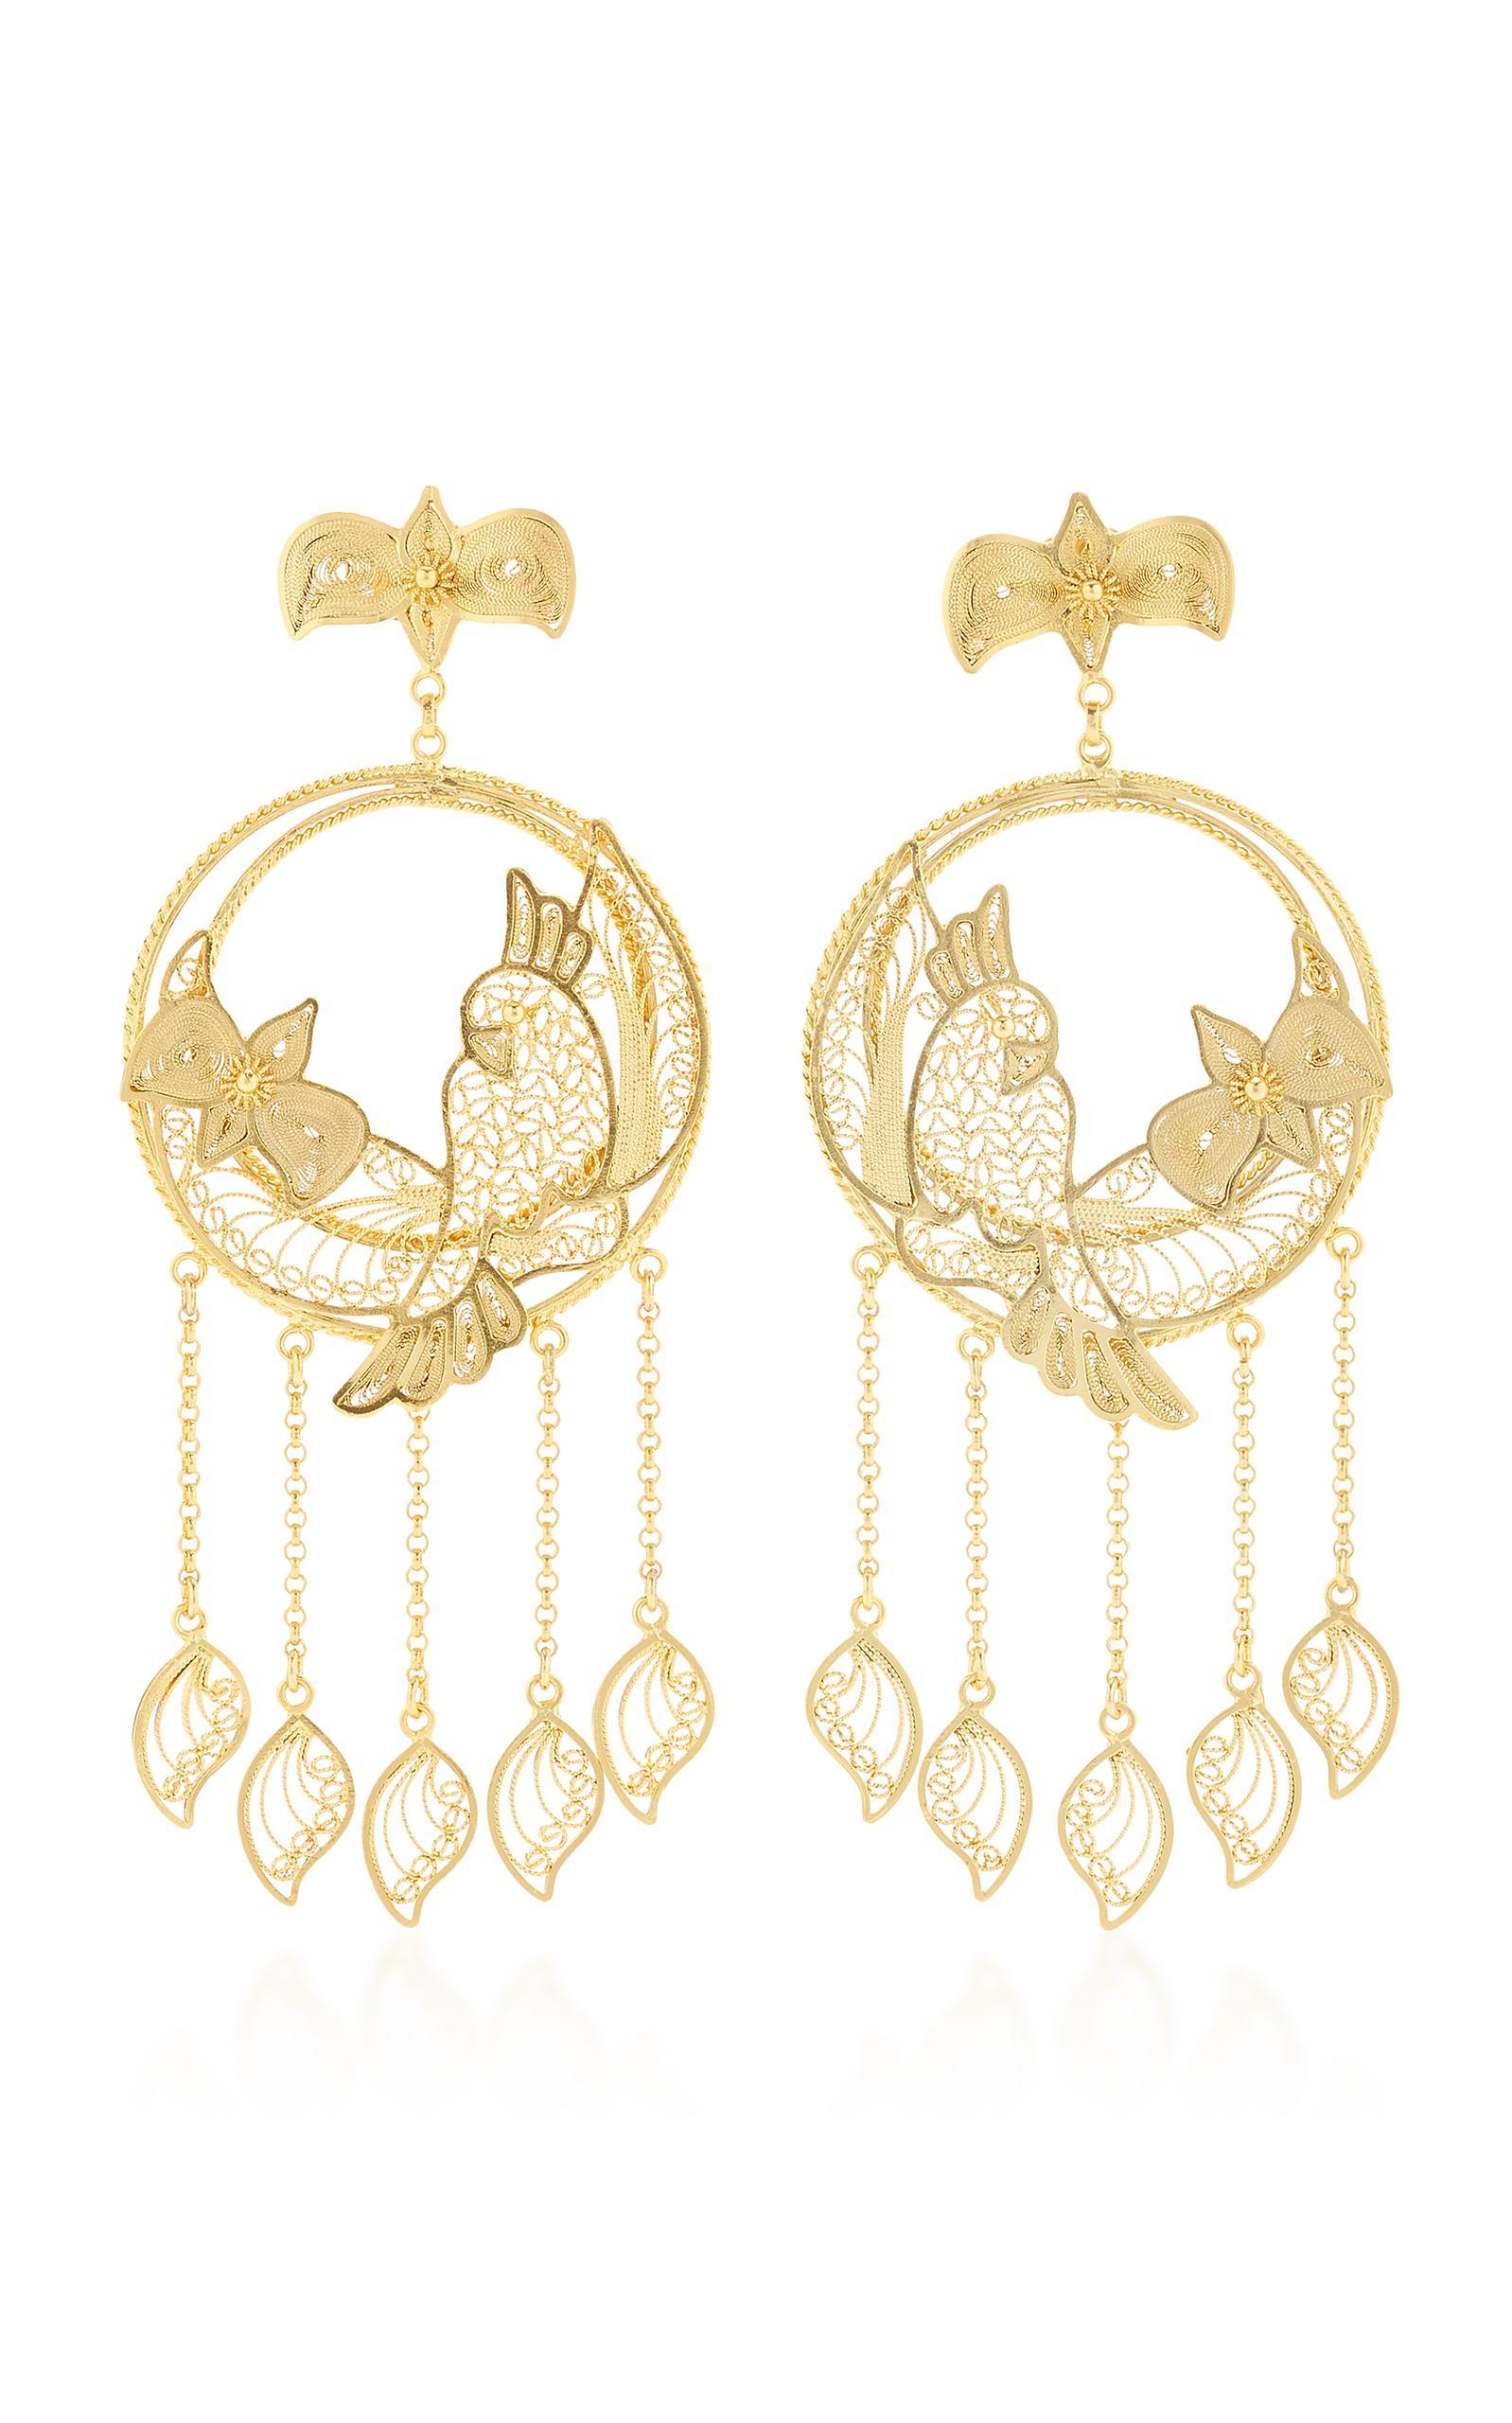 Mallarino Erika Gold Vermeil Earrings 5YwRs